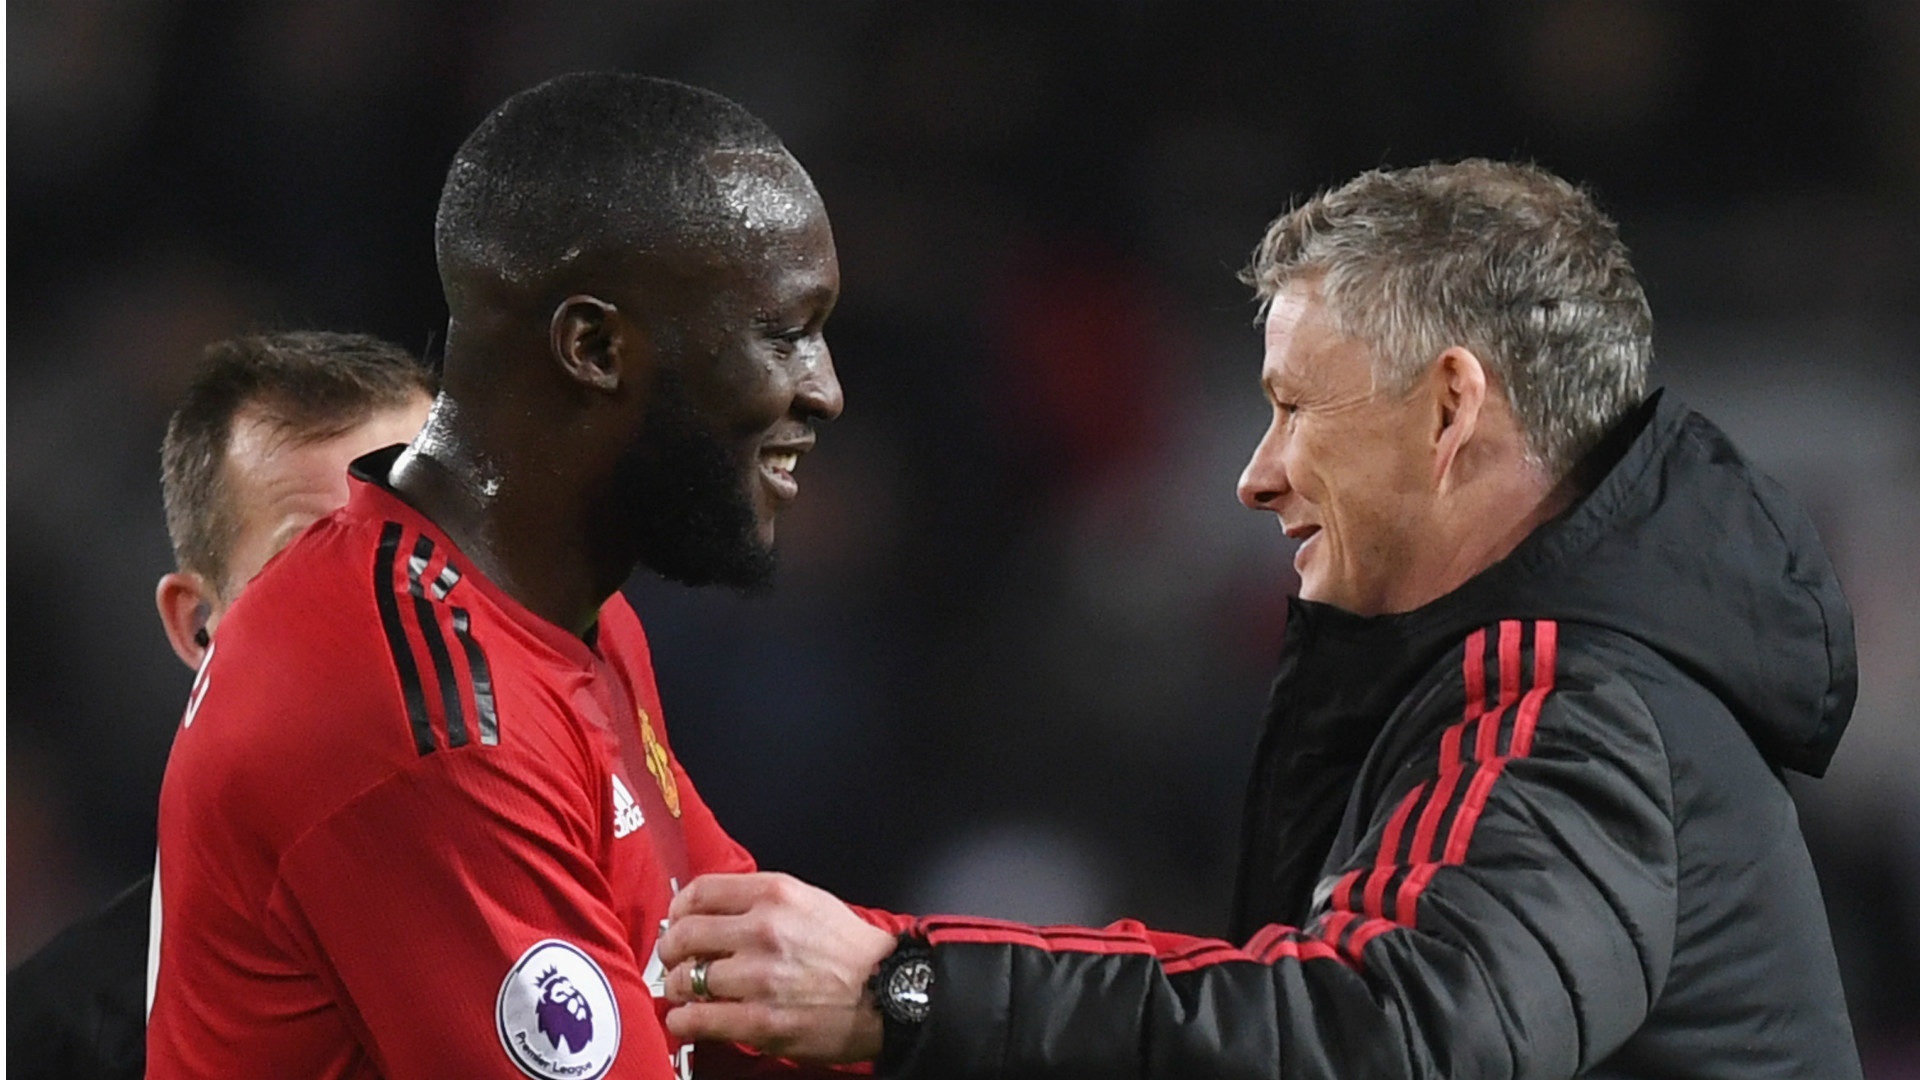 Romelu Lukaku Ole Gunnar Solskjaer Manchester United 2018-19